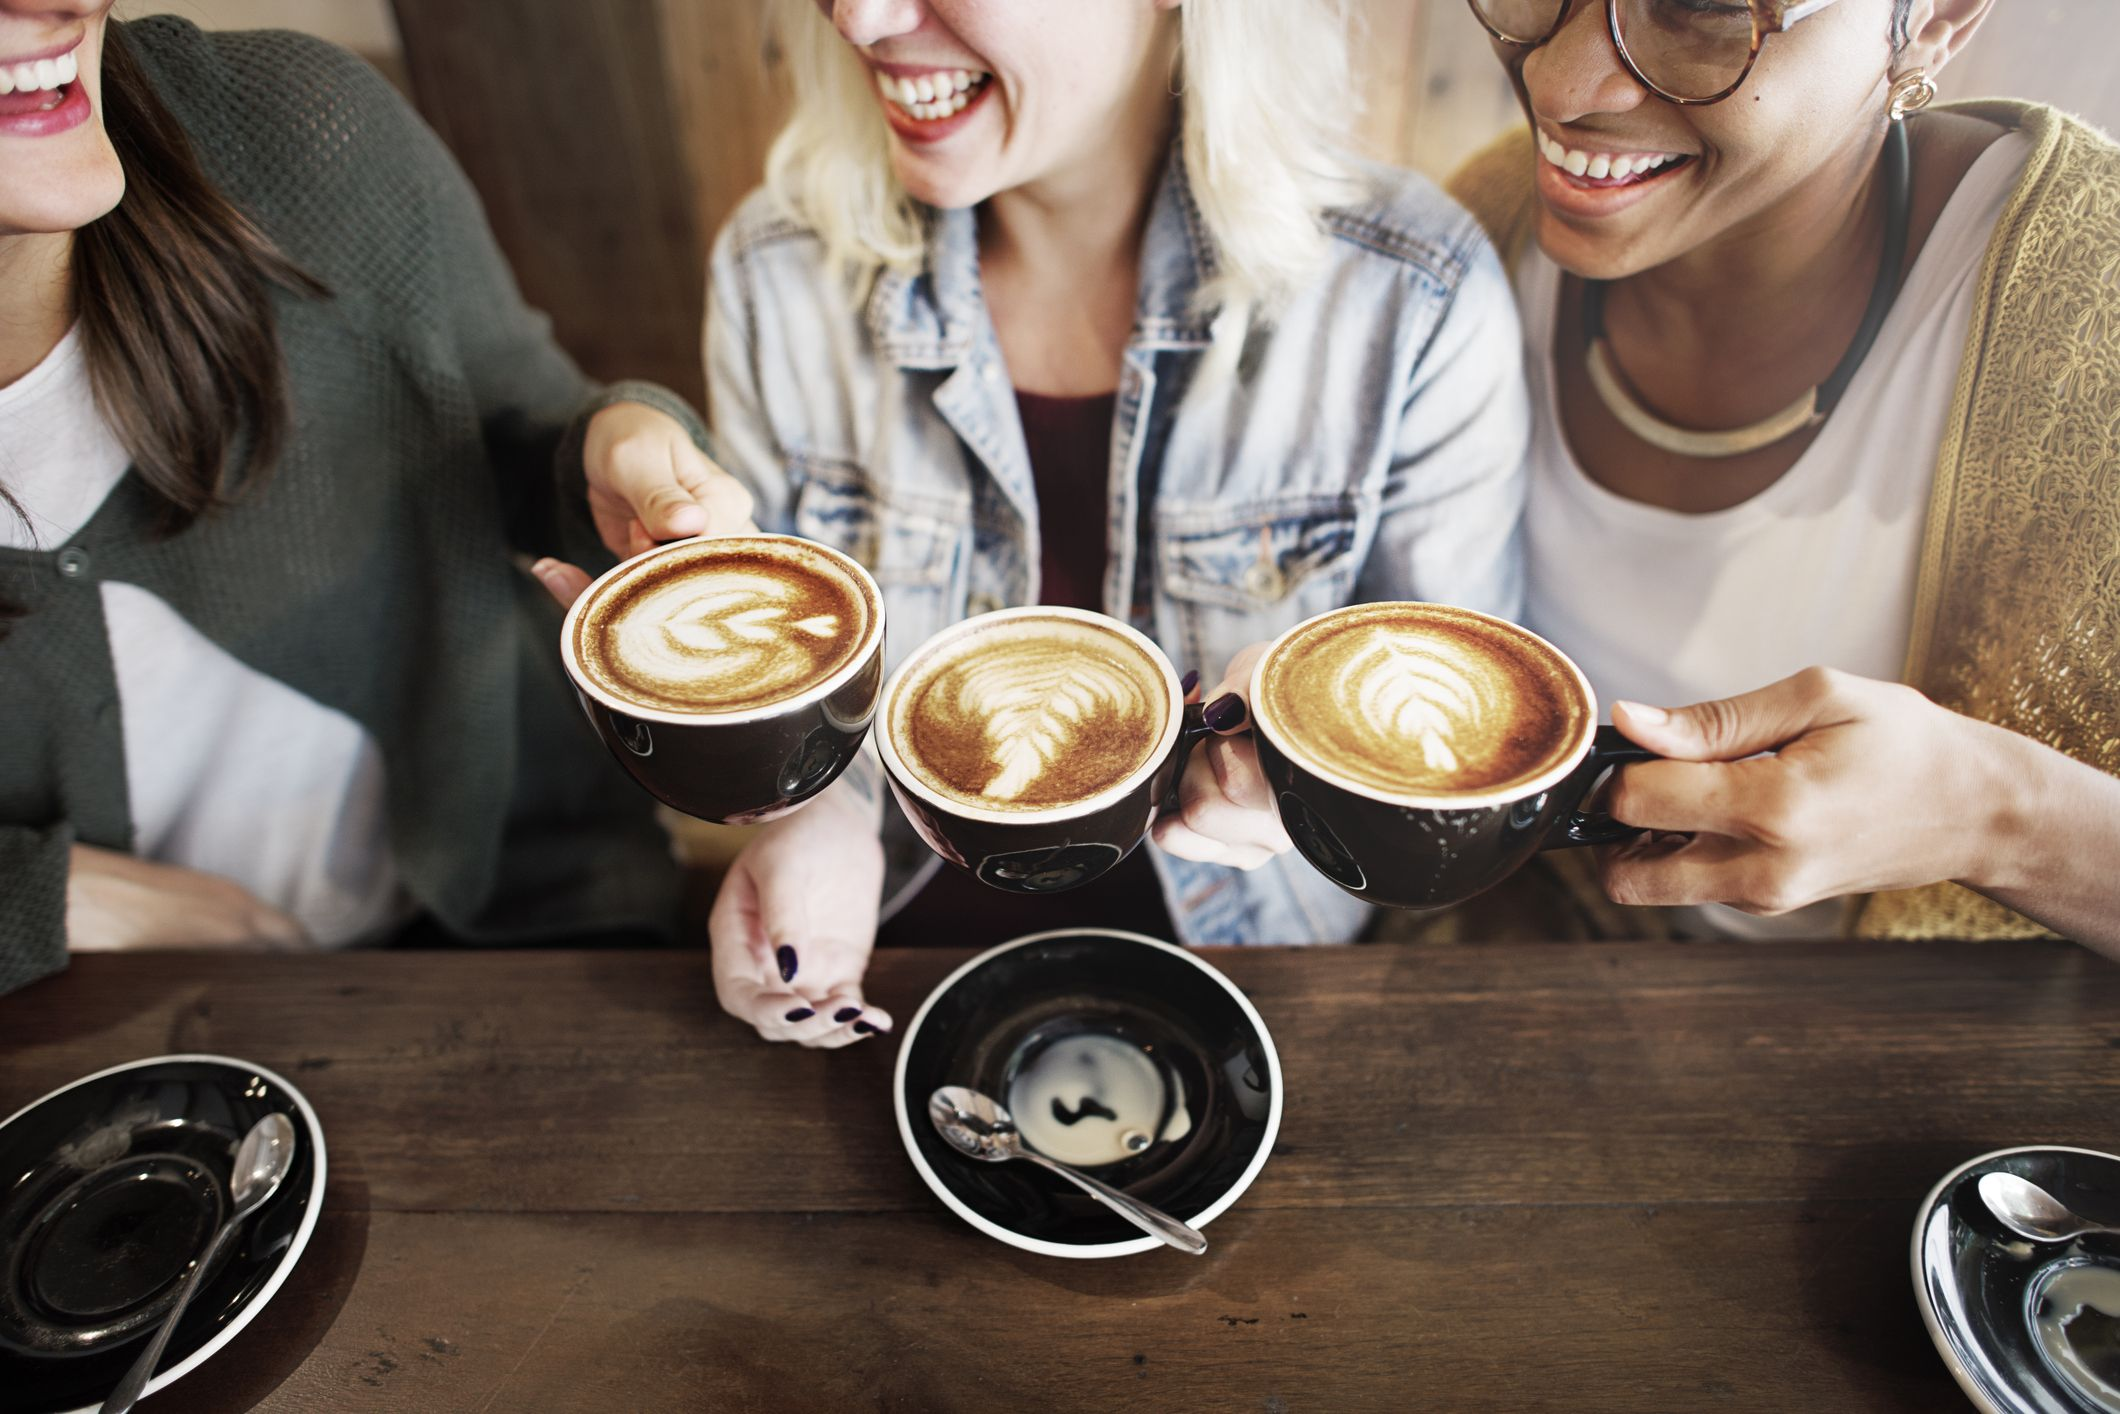 phentermine coffee together